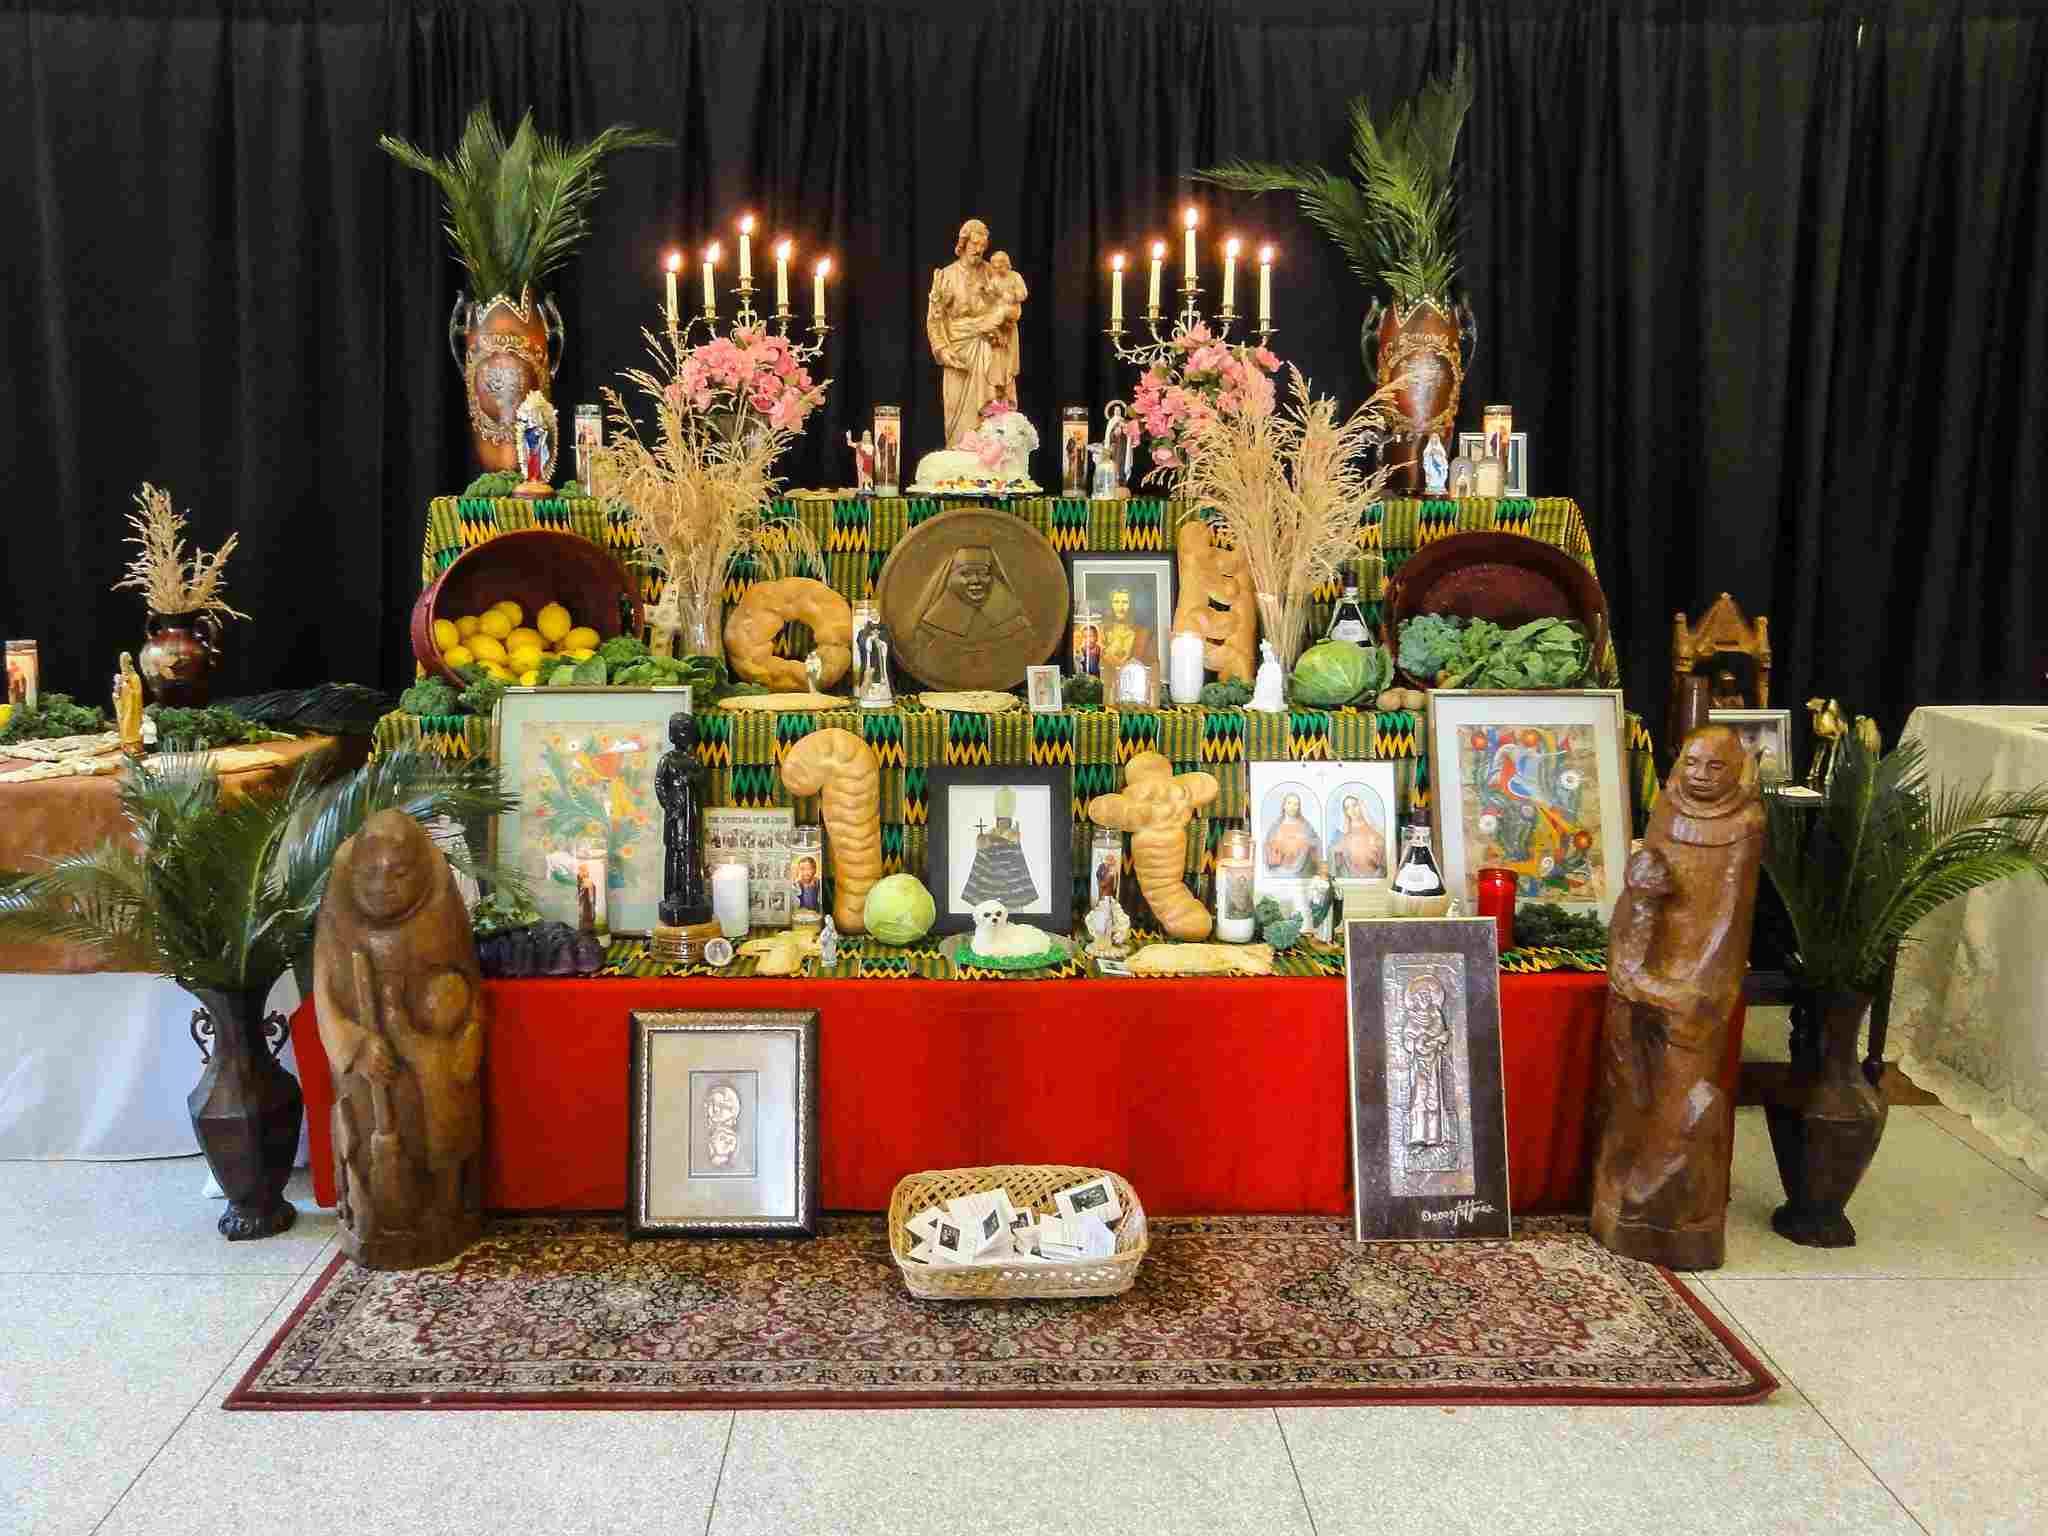 St. Joseph's Altar 2017